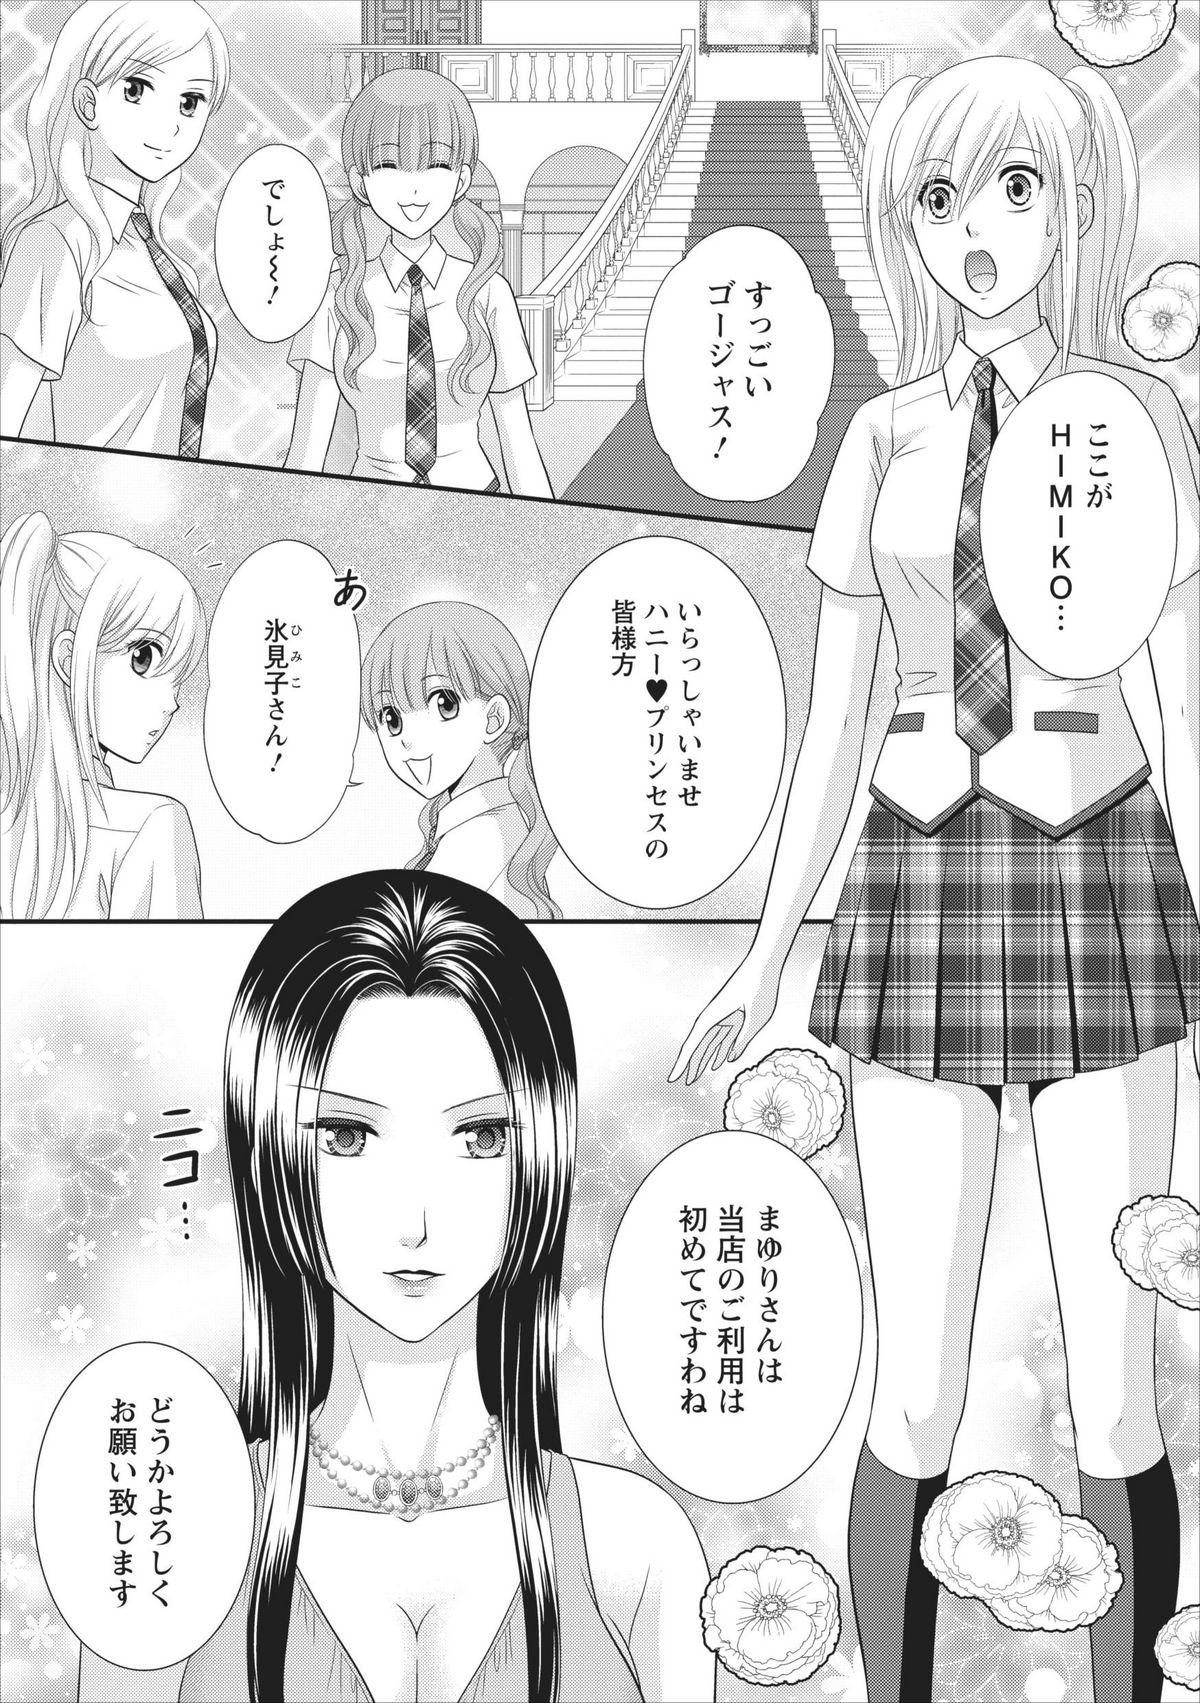 Himitsu Club Himiko - Inwai Kan no Joou ch.2 4